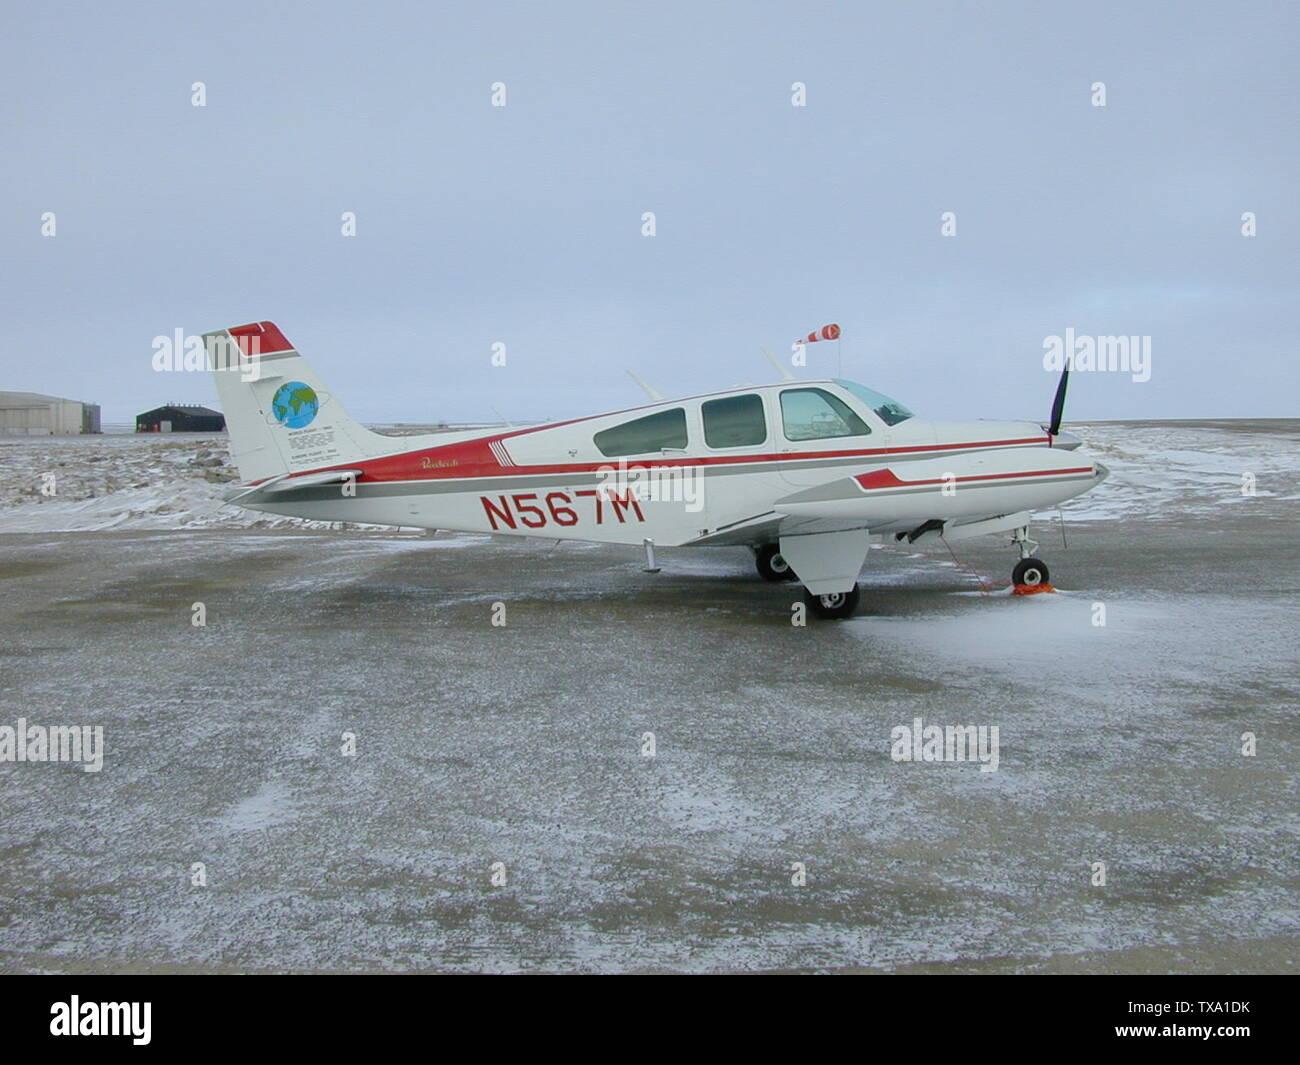 'English: N567M Beechcraft Bonanza F33A (BE33) Picture taken 10th June 1999 at 00:35 MDT (10th June 1999 06:35Z) at Cambridge Bay Airport, Nunavut, Canada; 10 June 1999; Own work; User:CambridgeBayWeather; ' - Stock Image